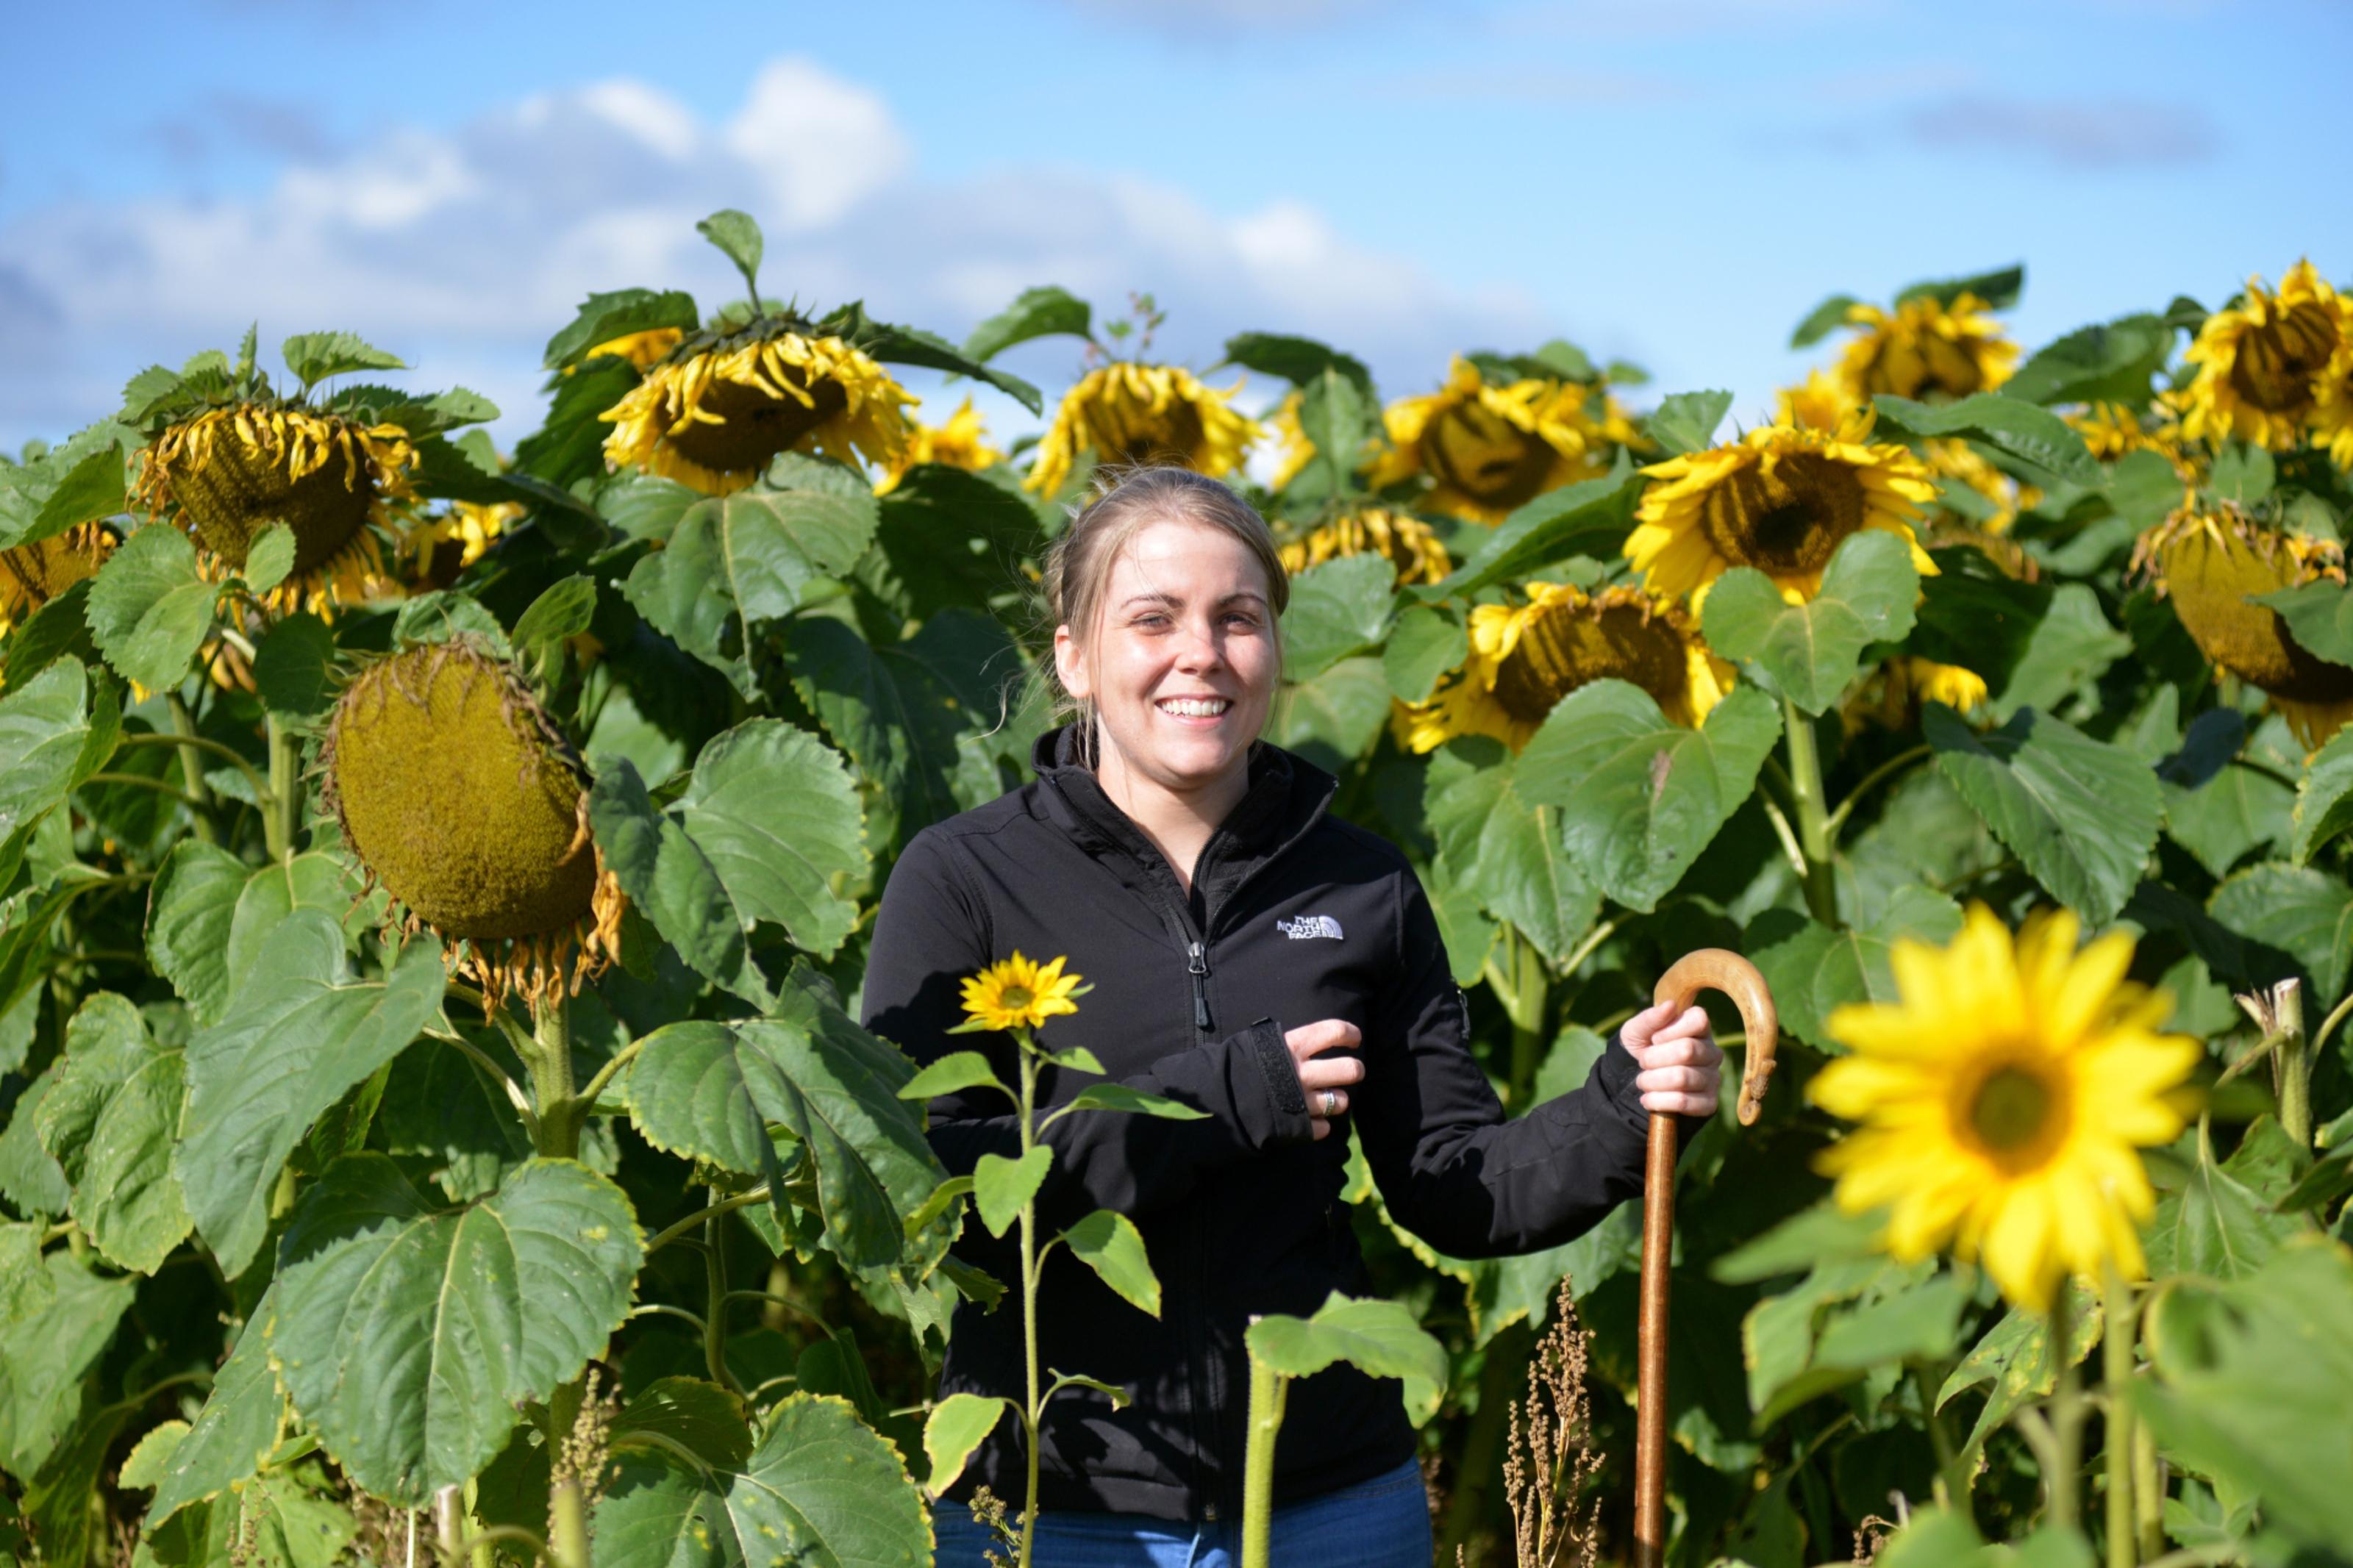 Claire Pollocks looks after four farms in Fife and runs Ardross Farm Shop.